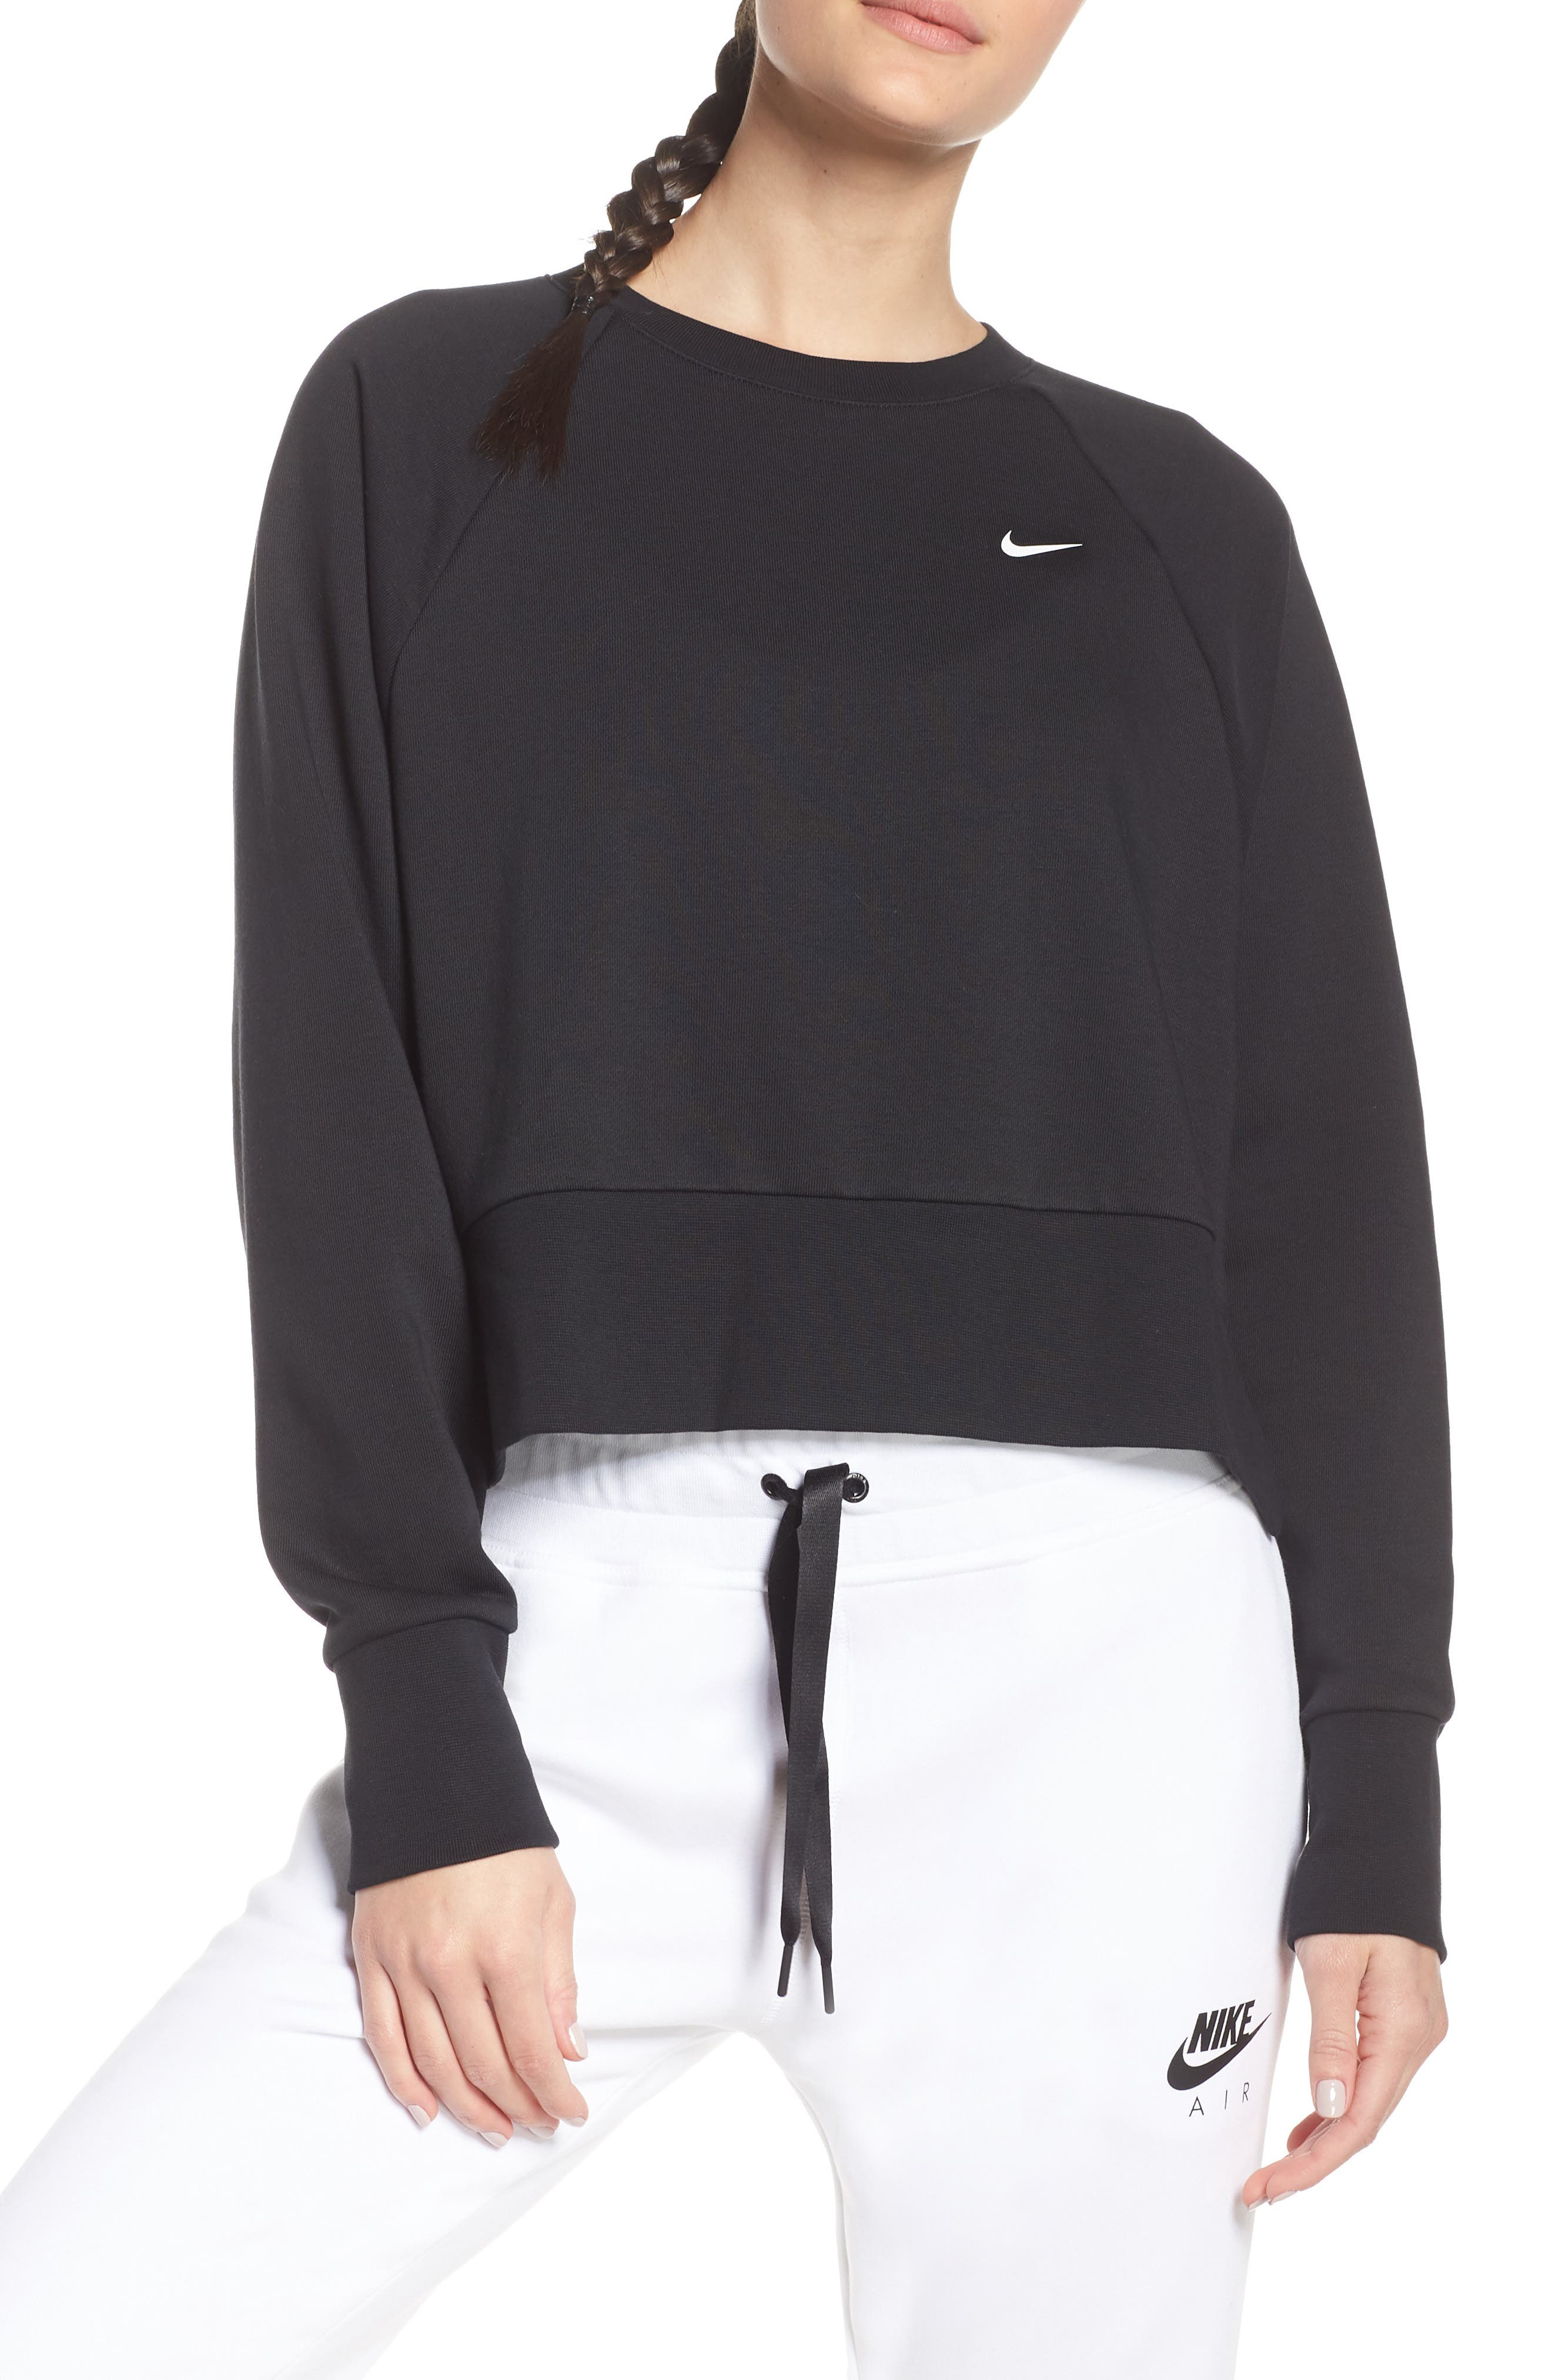 NIKE, Dry Crop Training Sweatshirt, Main thumbnail 1, color, BLACK/ WHITE